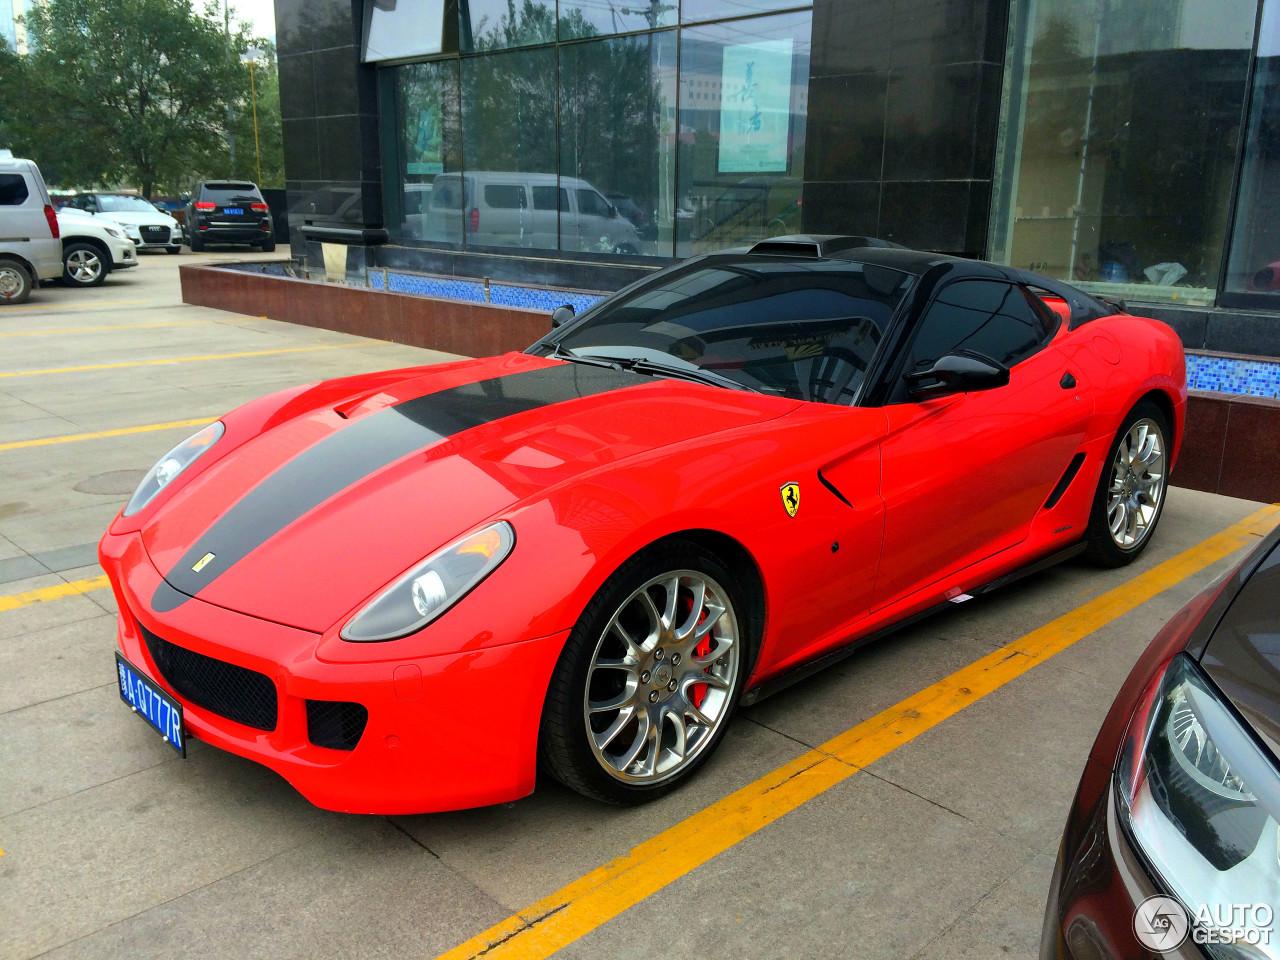 Ferrari 599 gtb fiorano hgte china edition 25 november 2014 8 i ferrari 599 gtb fiorano hgte china edition 8 vanachro Image collections